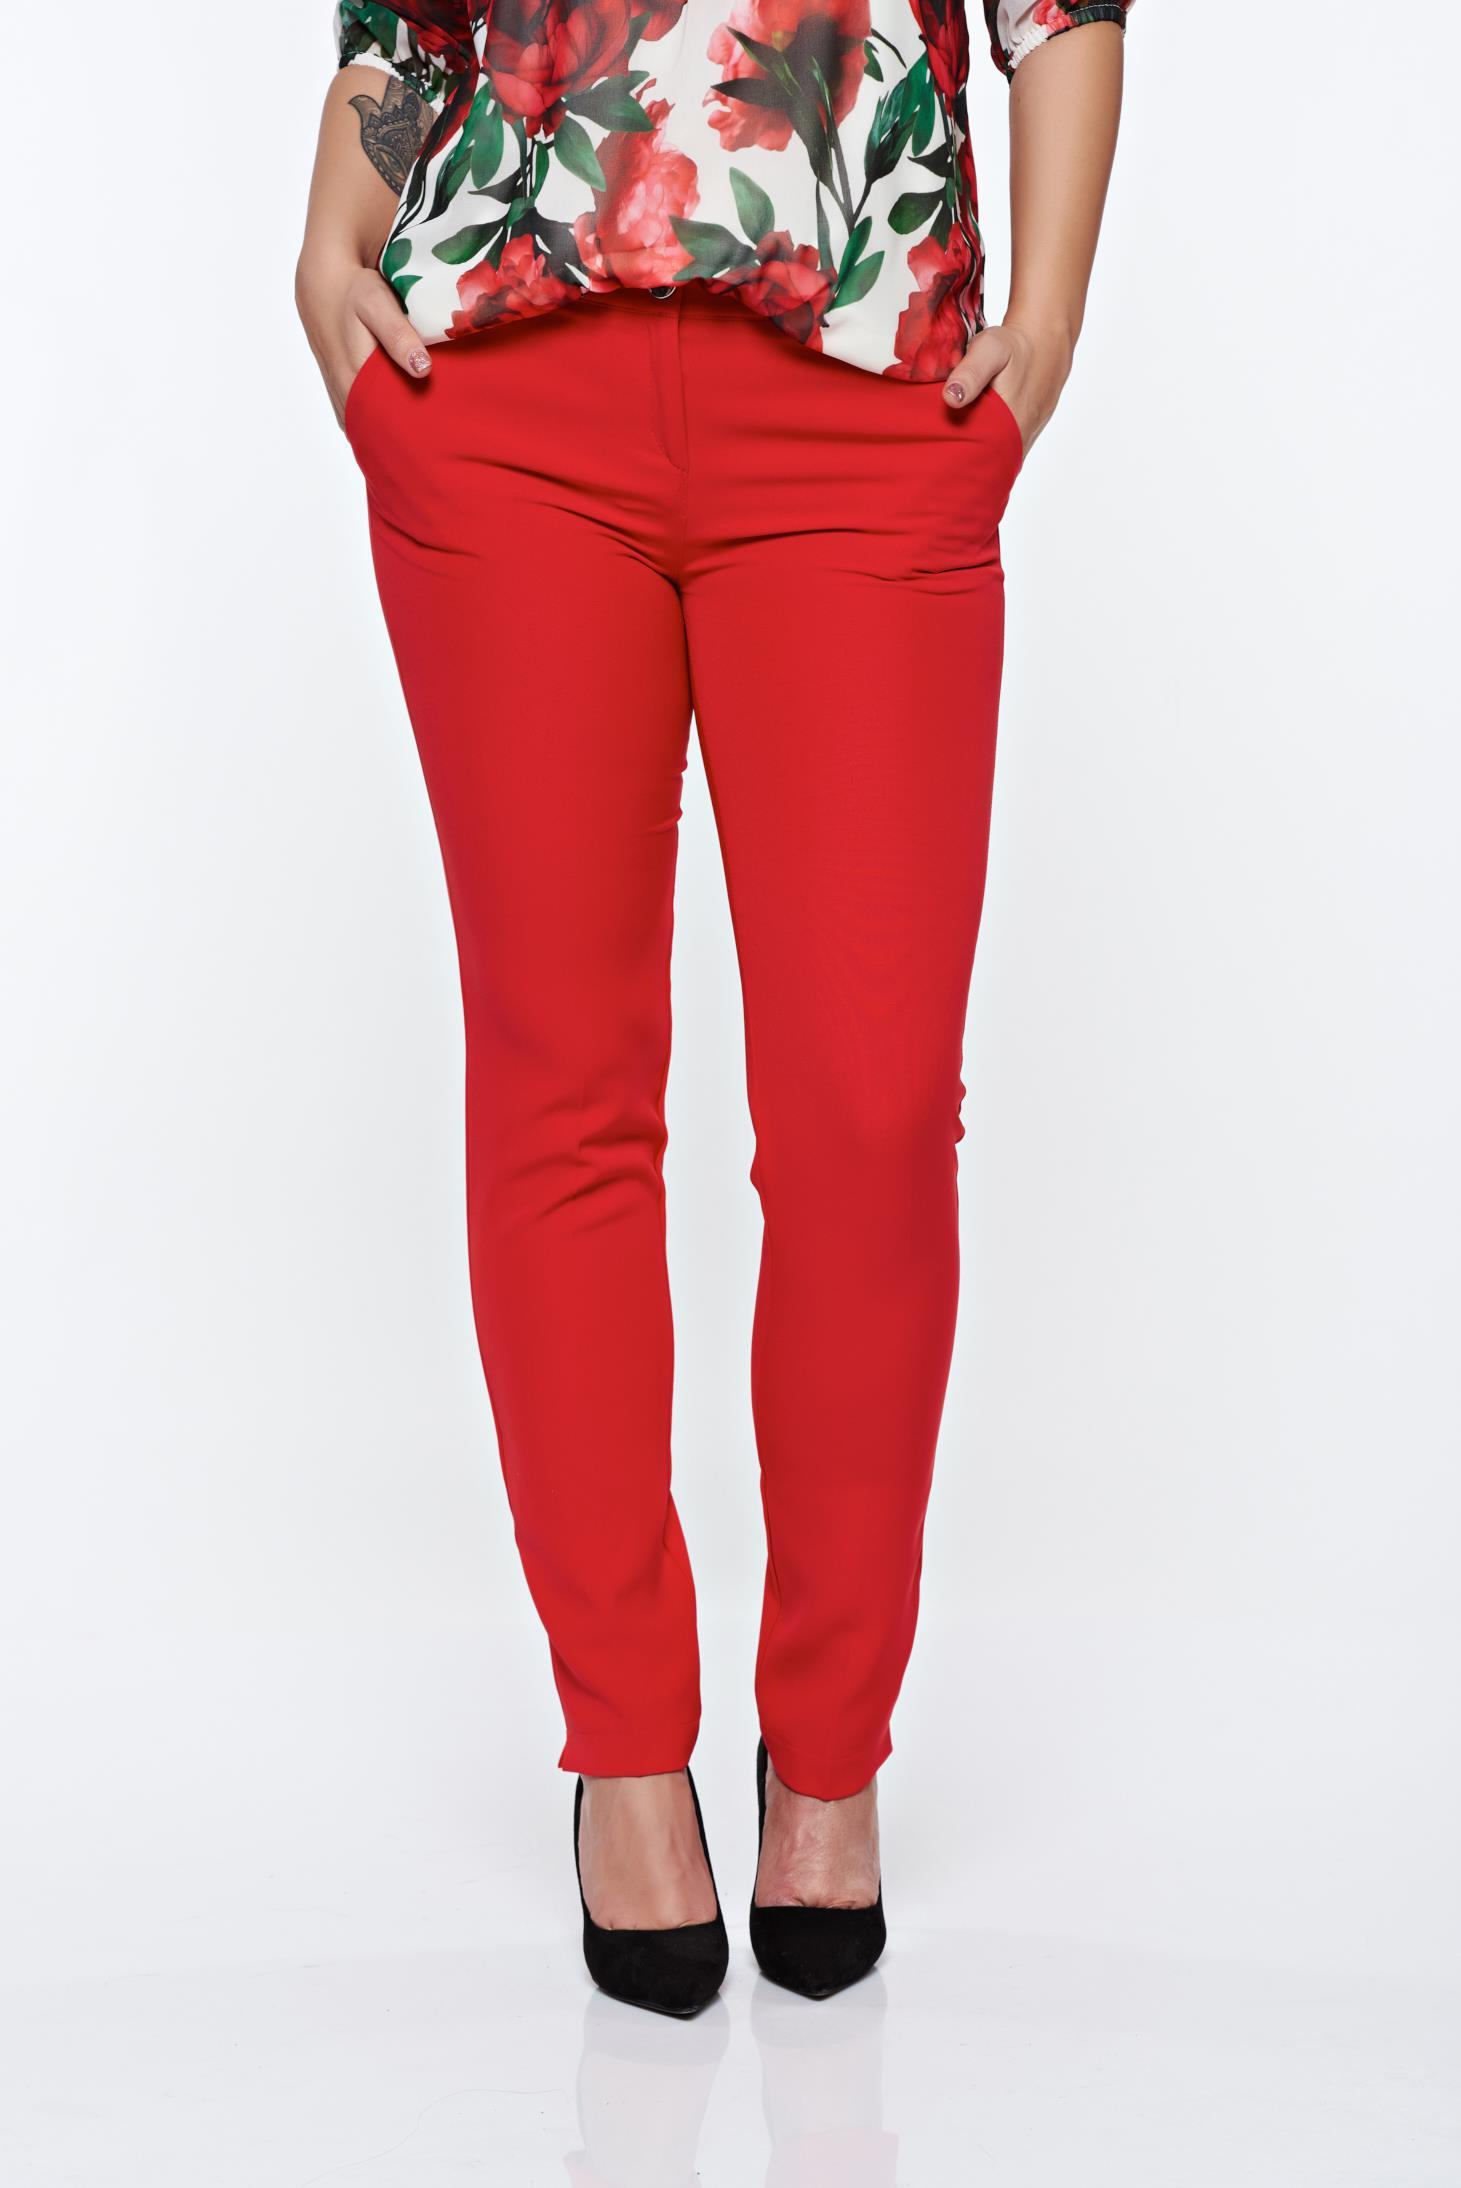 368a8daeb8 Piros PrettyGirl elegáns kónikus nadrág zsebes enyhén rugalmas anyag